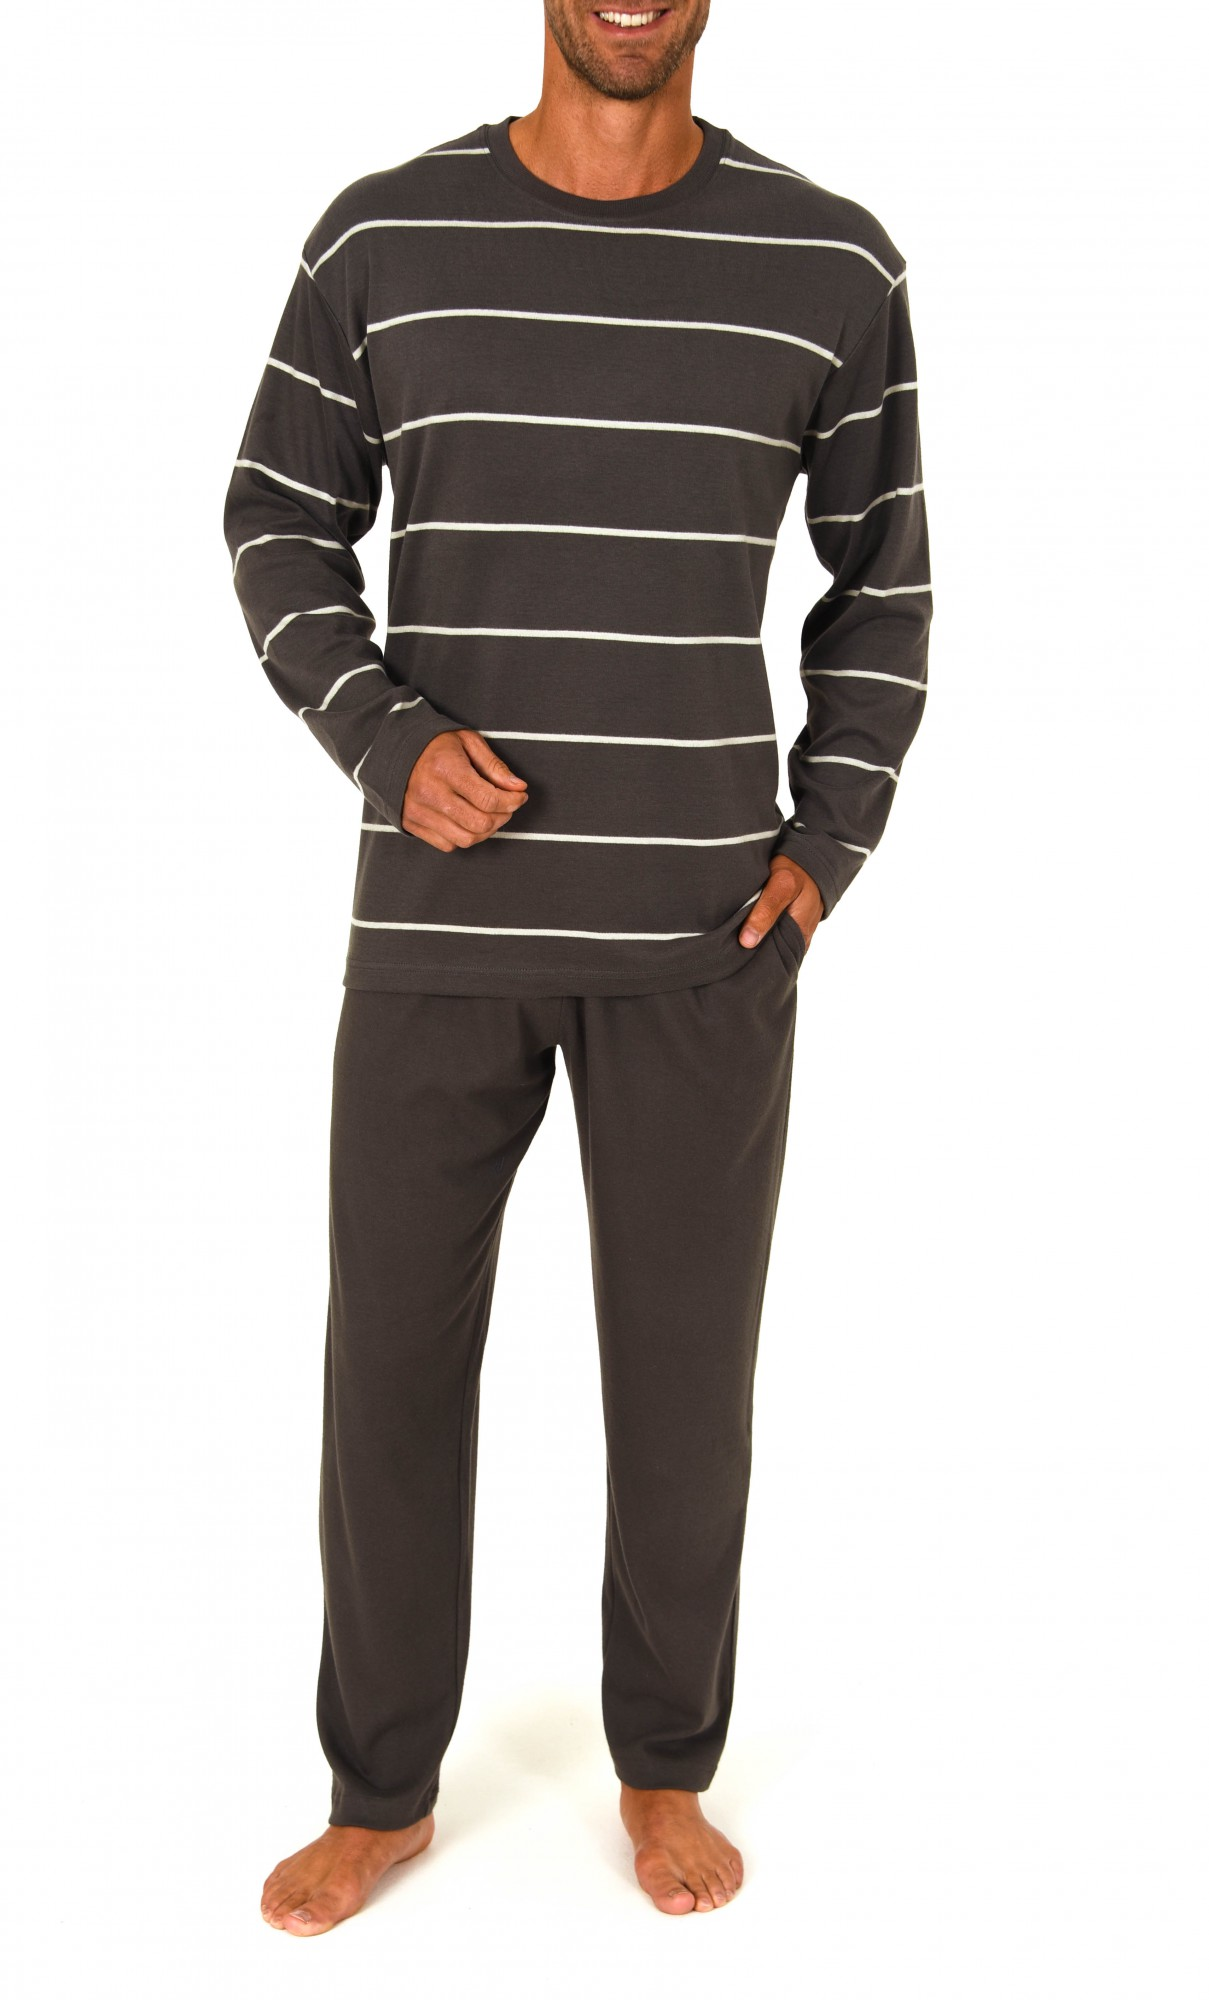 Pyjama lang, Rundhals, Interlock, 251 101 96 779 001